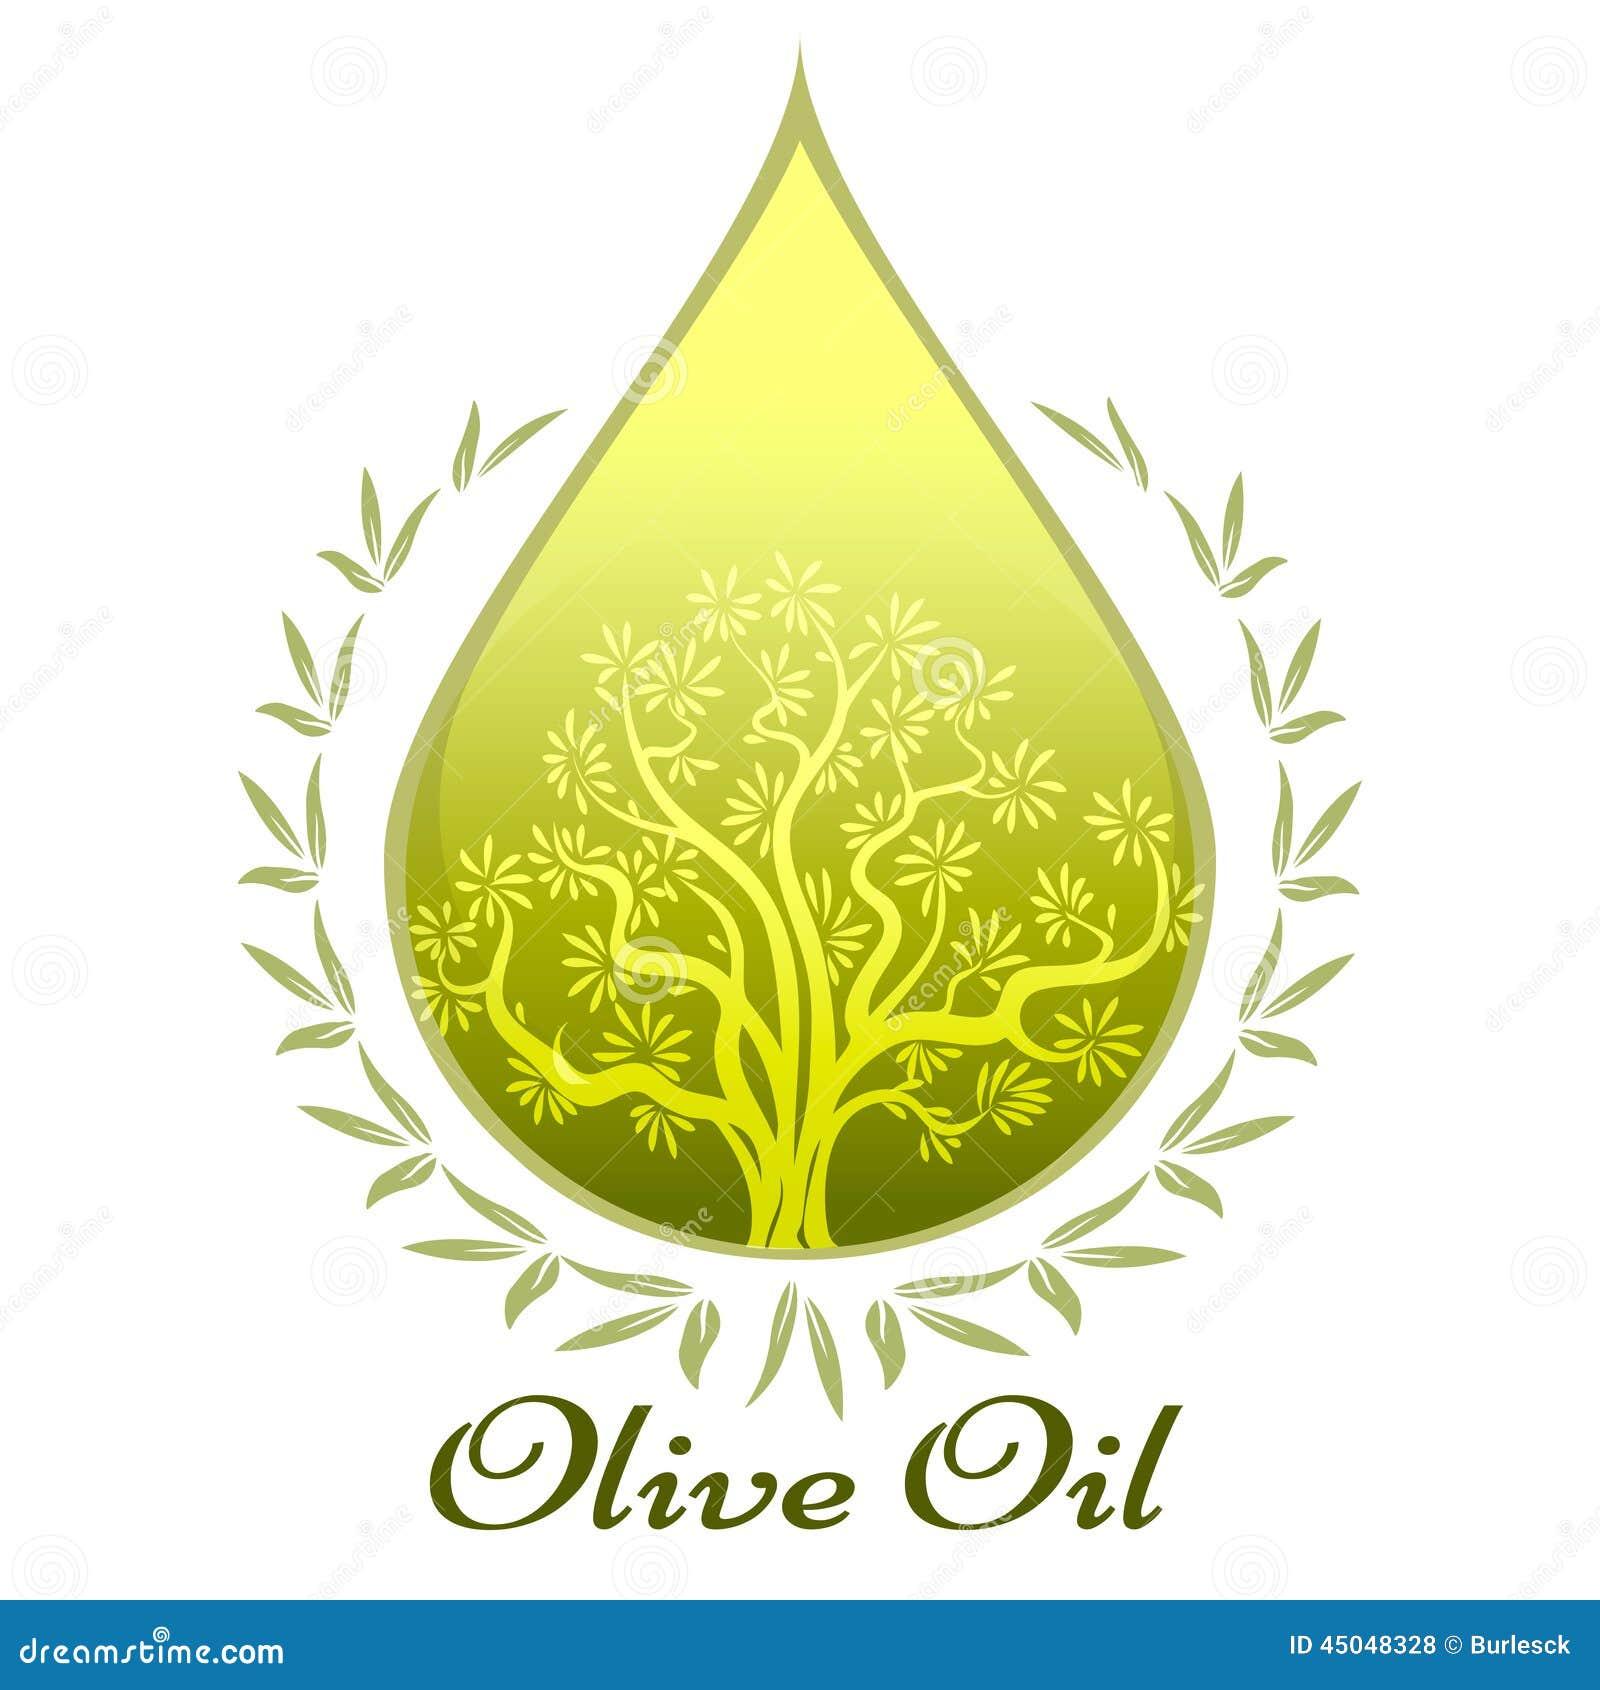 2016 NUOVO Extra Virgin Cortona Olive Oil - 250ml Gold Label  |Extra Virgin Olive Oil Label